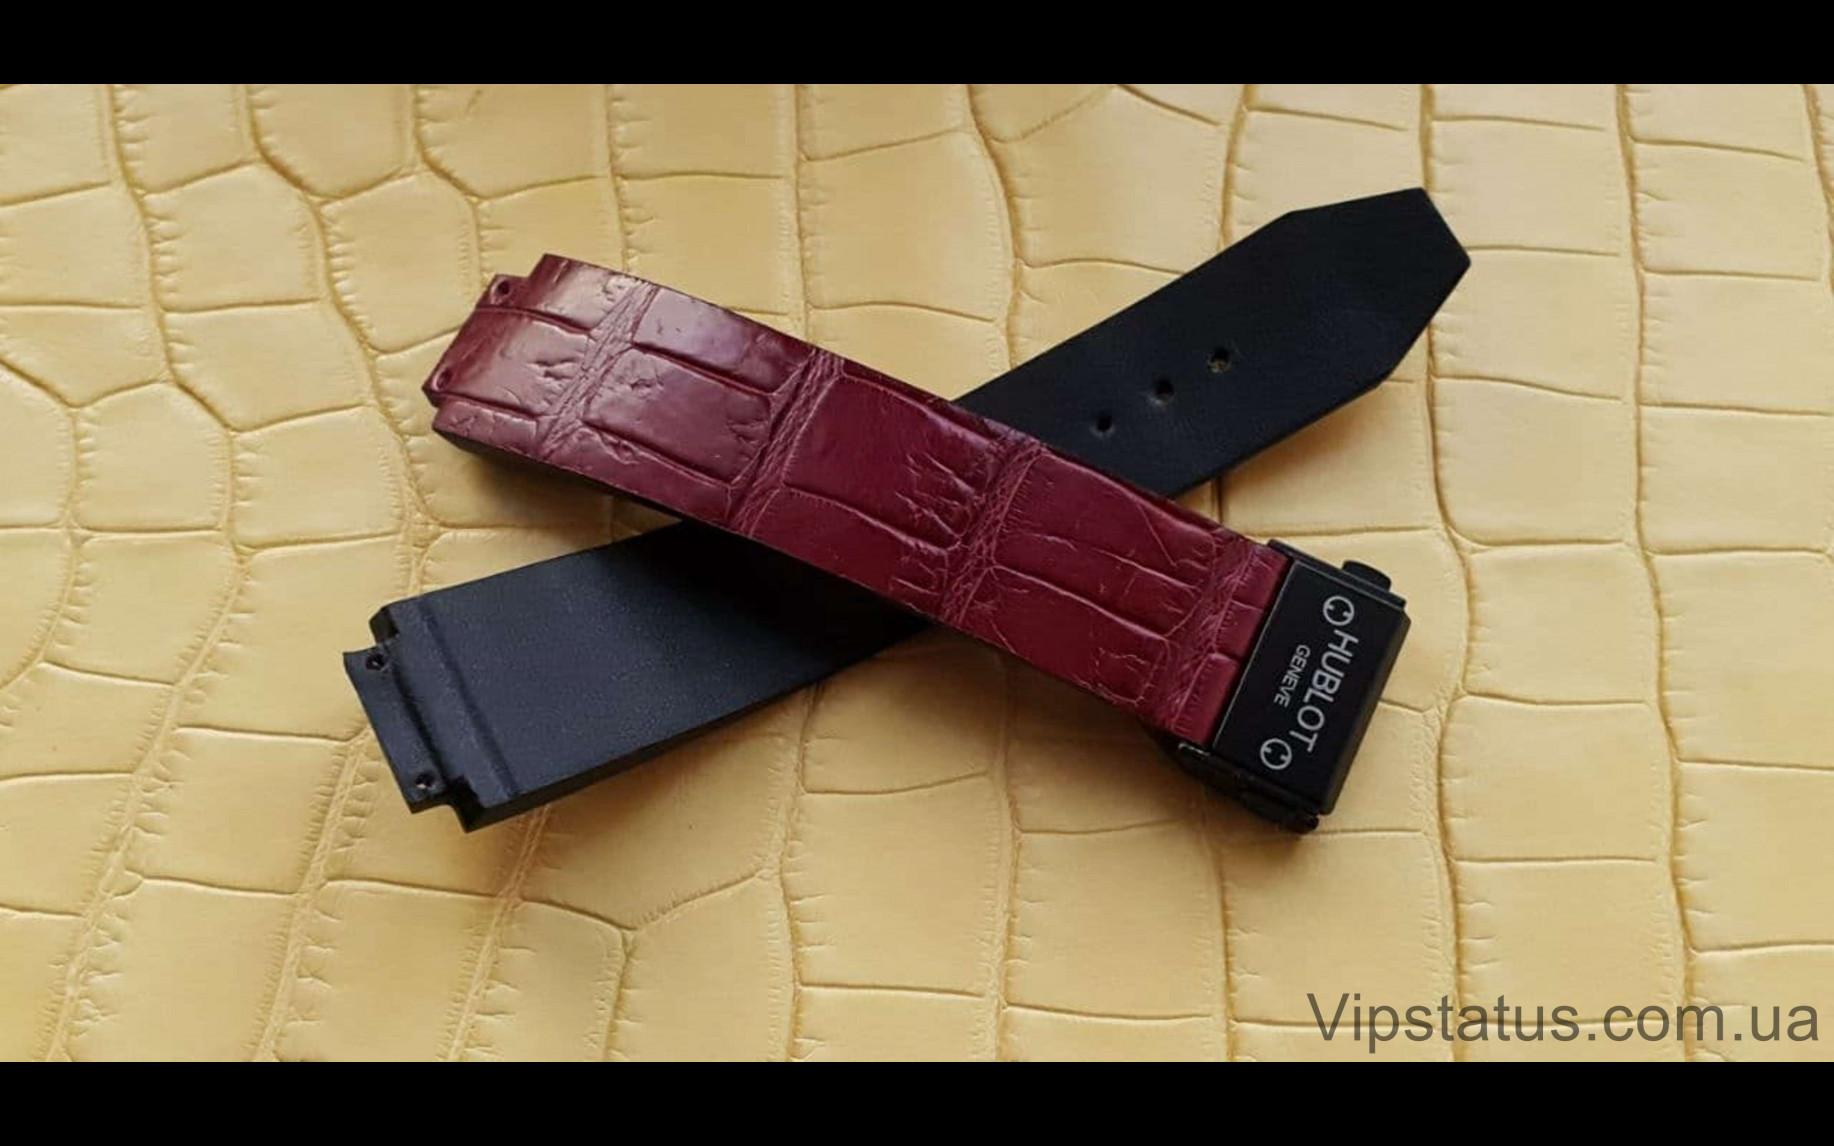 Elite Премиум ремешок для часов Hublot кожа крокодила Premium Crocodile Strap for Hublot watches image 4